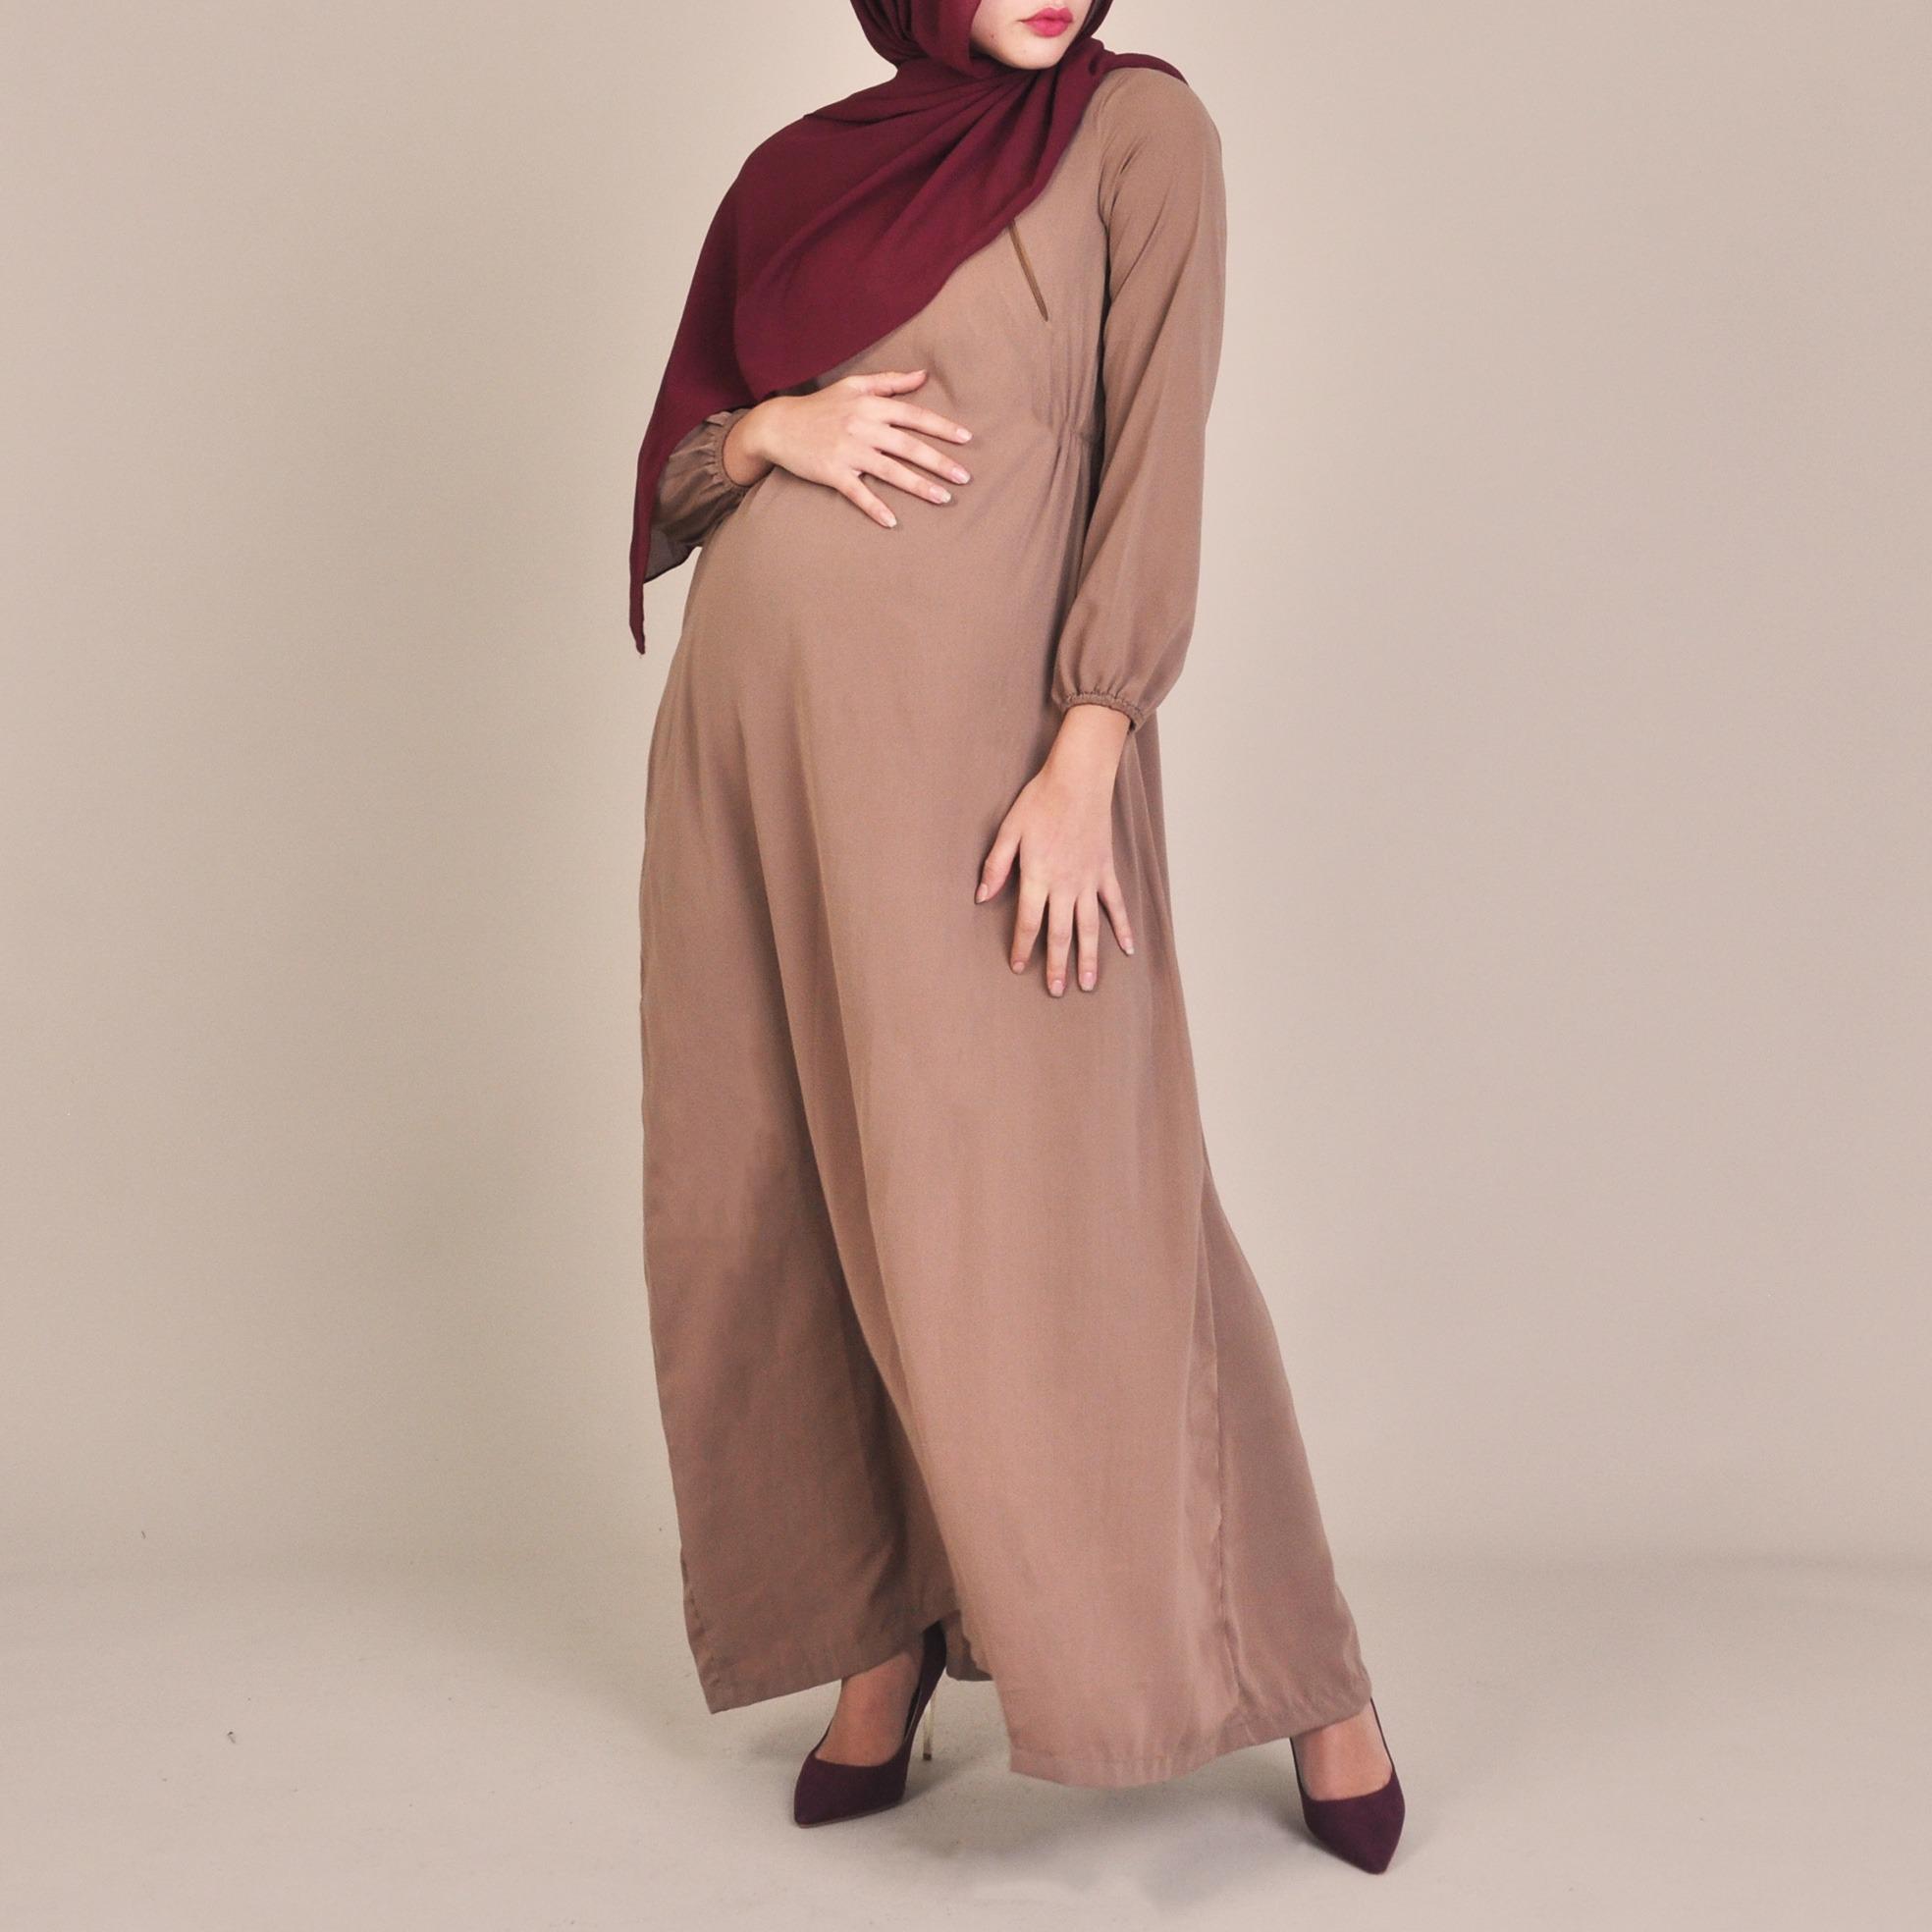 488a77b20fc63 Saira | Neutral Maternity Abaya Nursing Friendly Pregnancy Style | BIAH